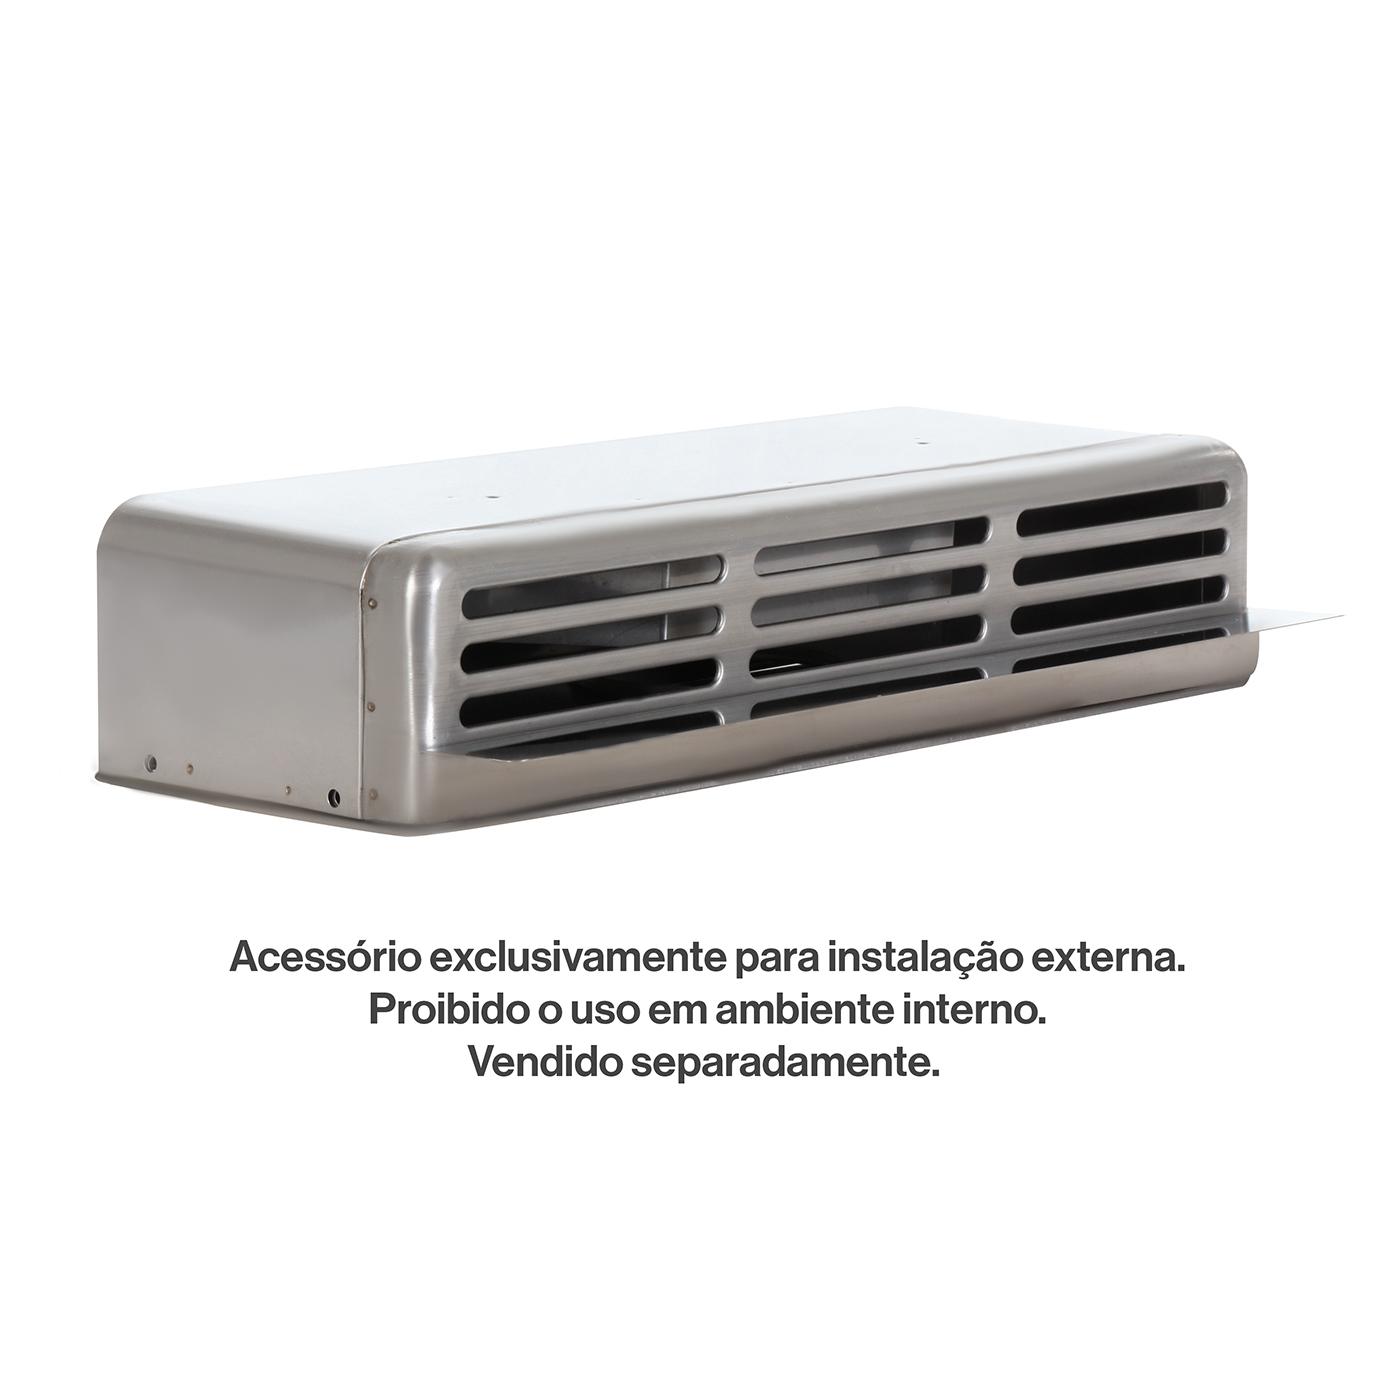 Kit instalação externa REU-2802 FEC